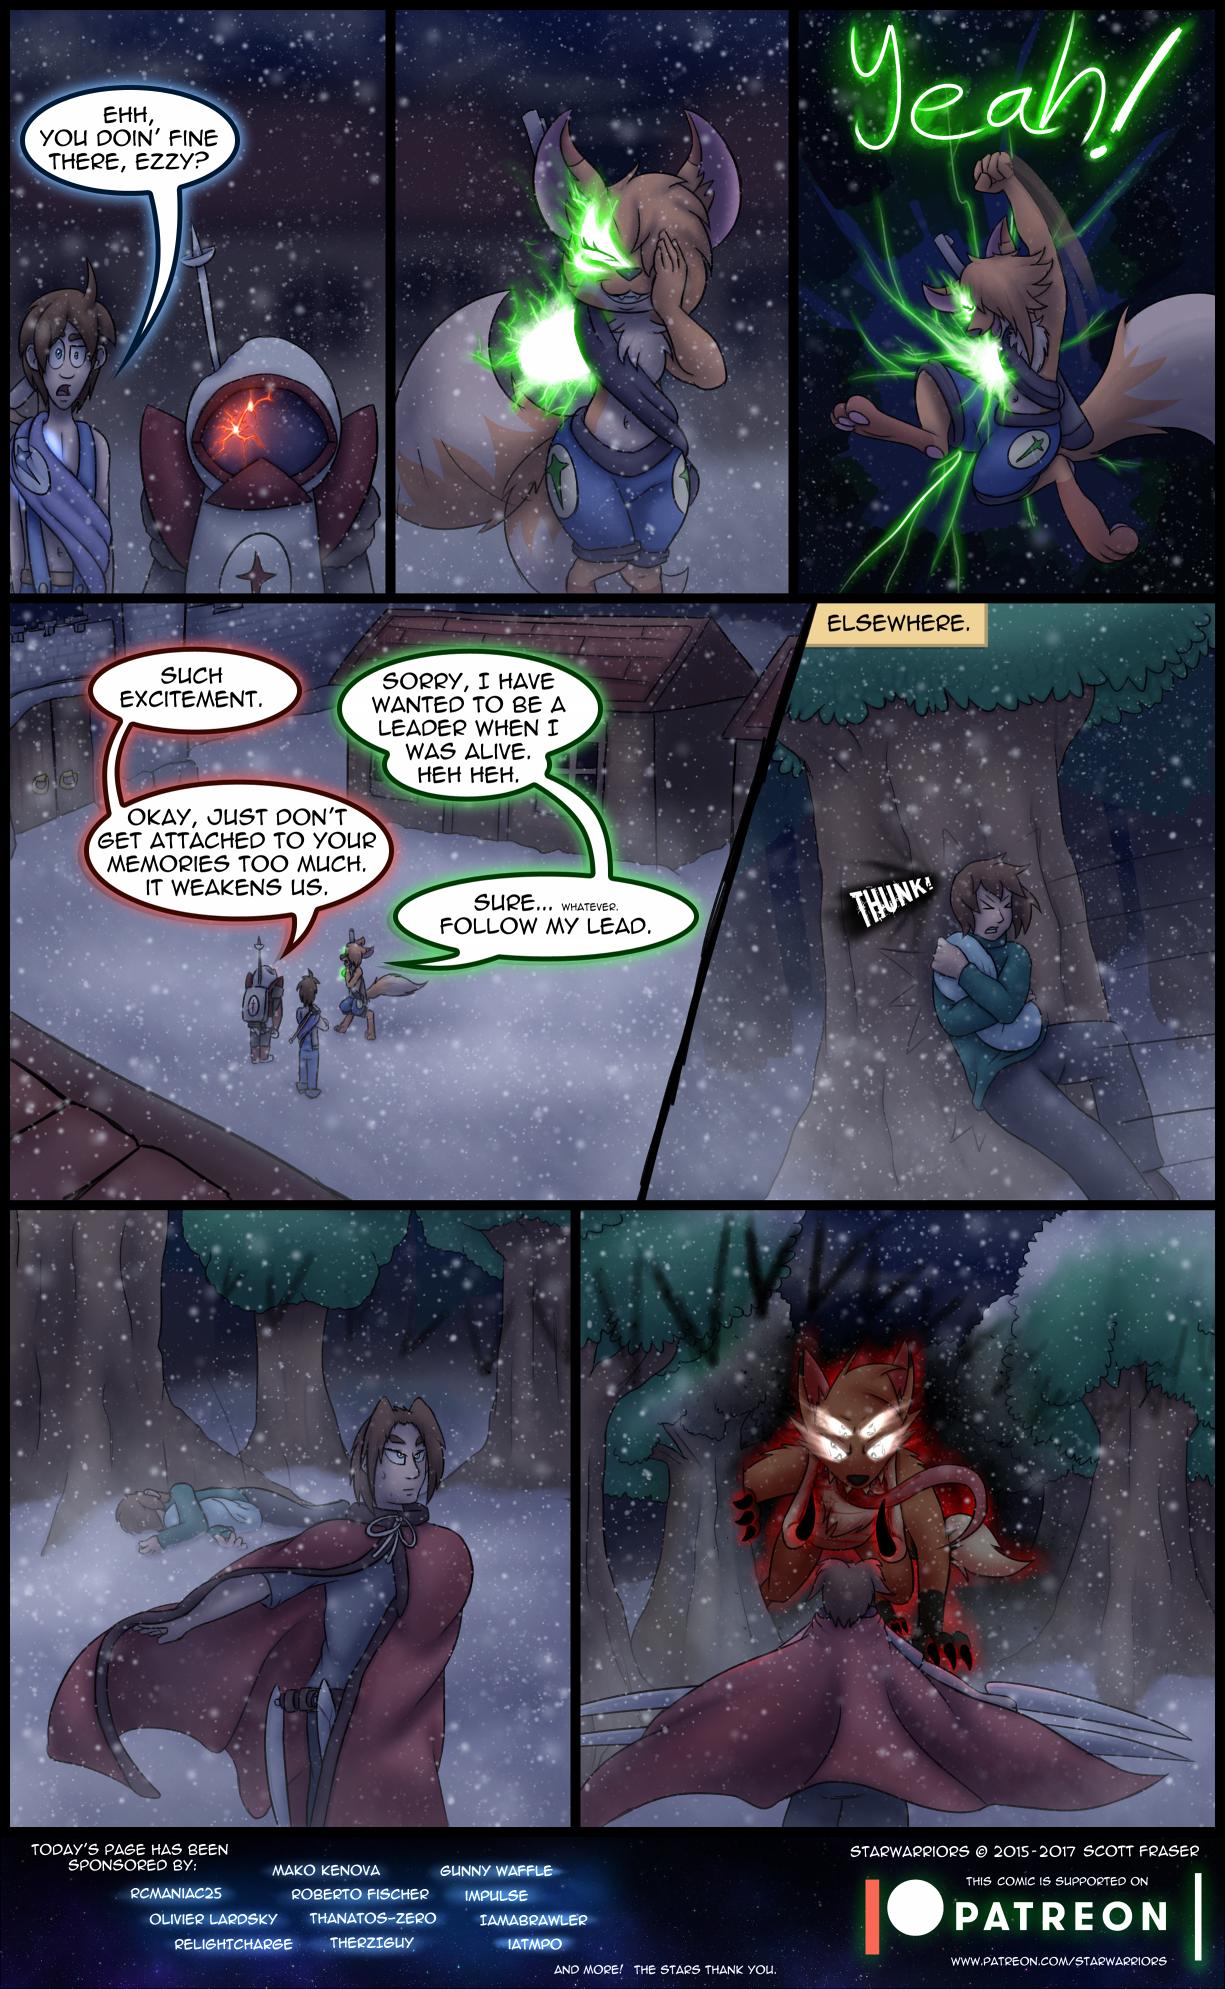 Ch3 Page 23 – Confrontation